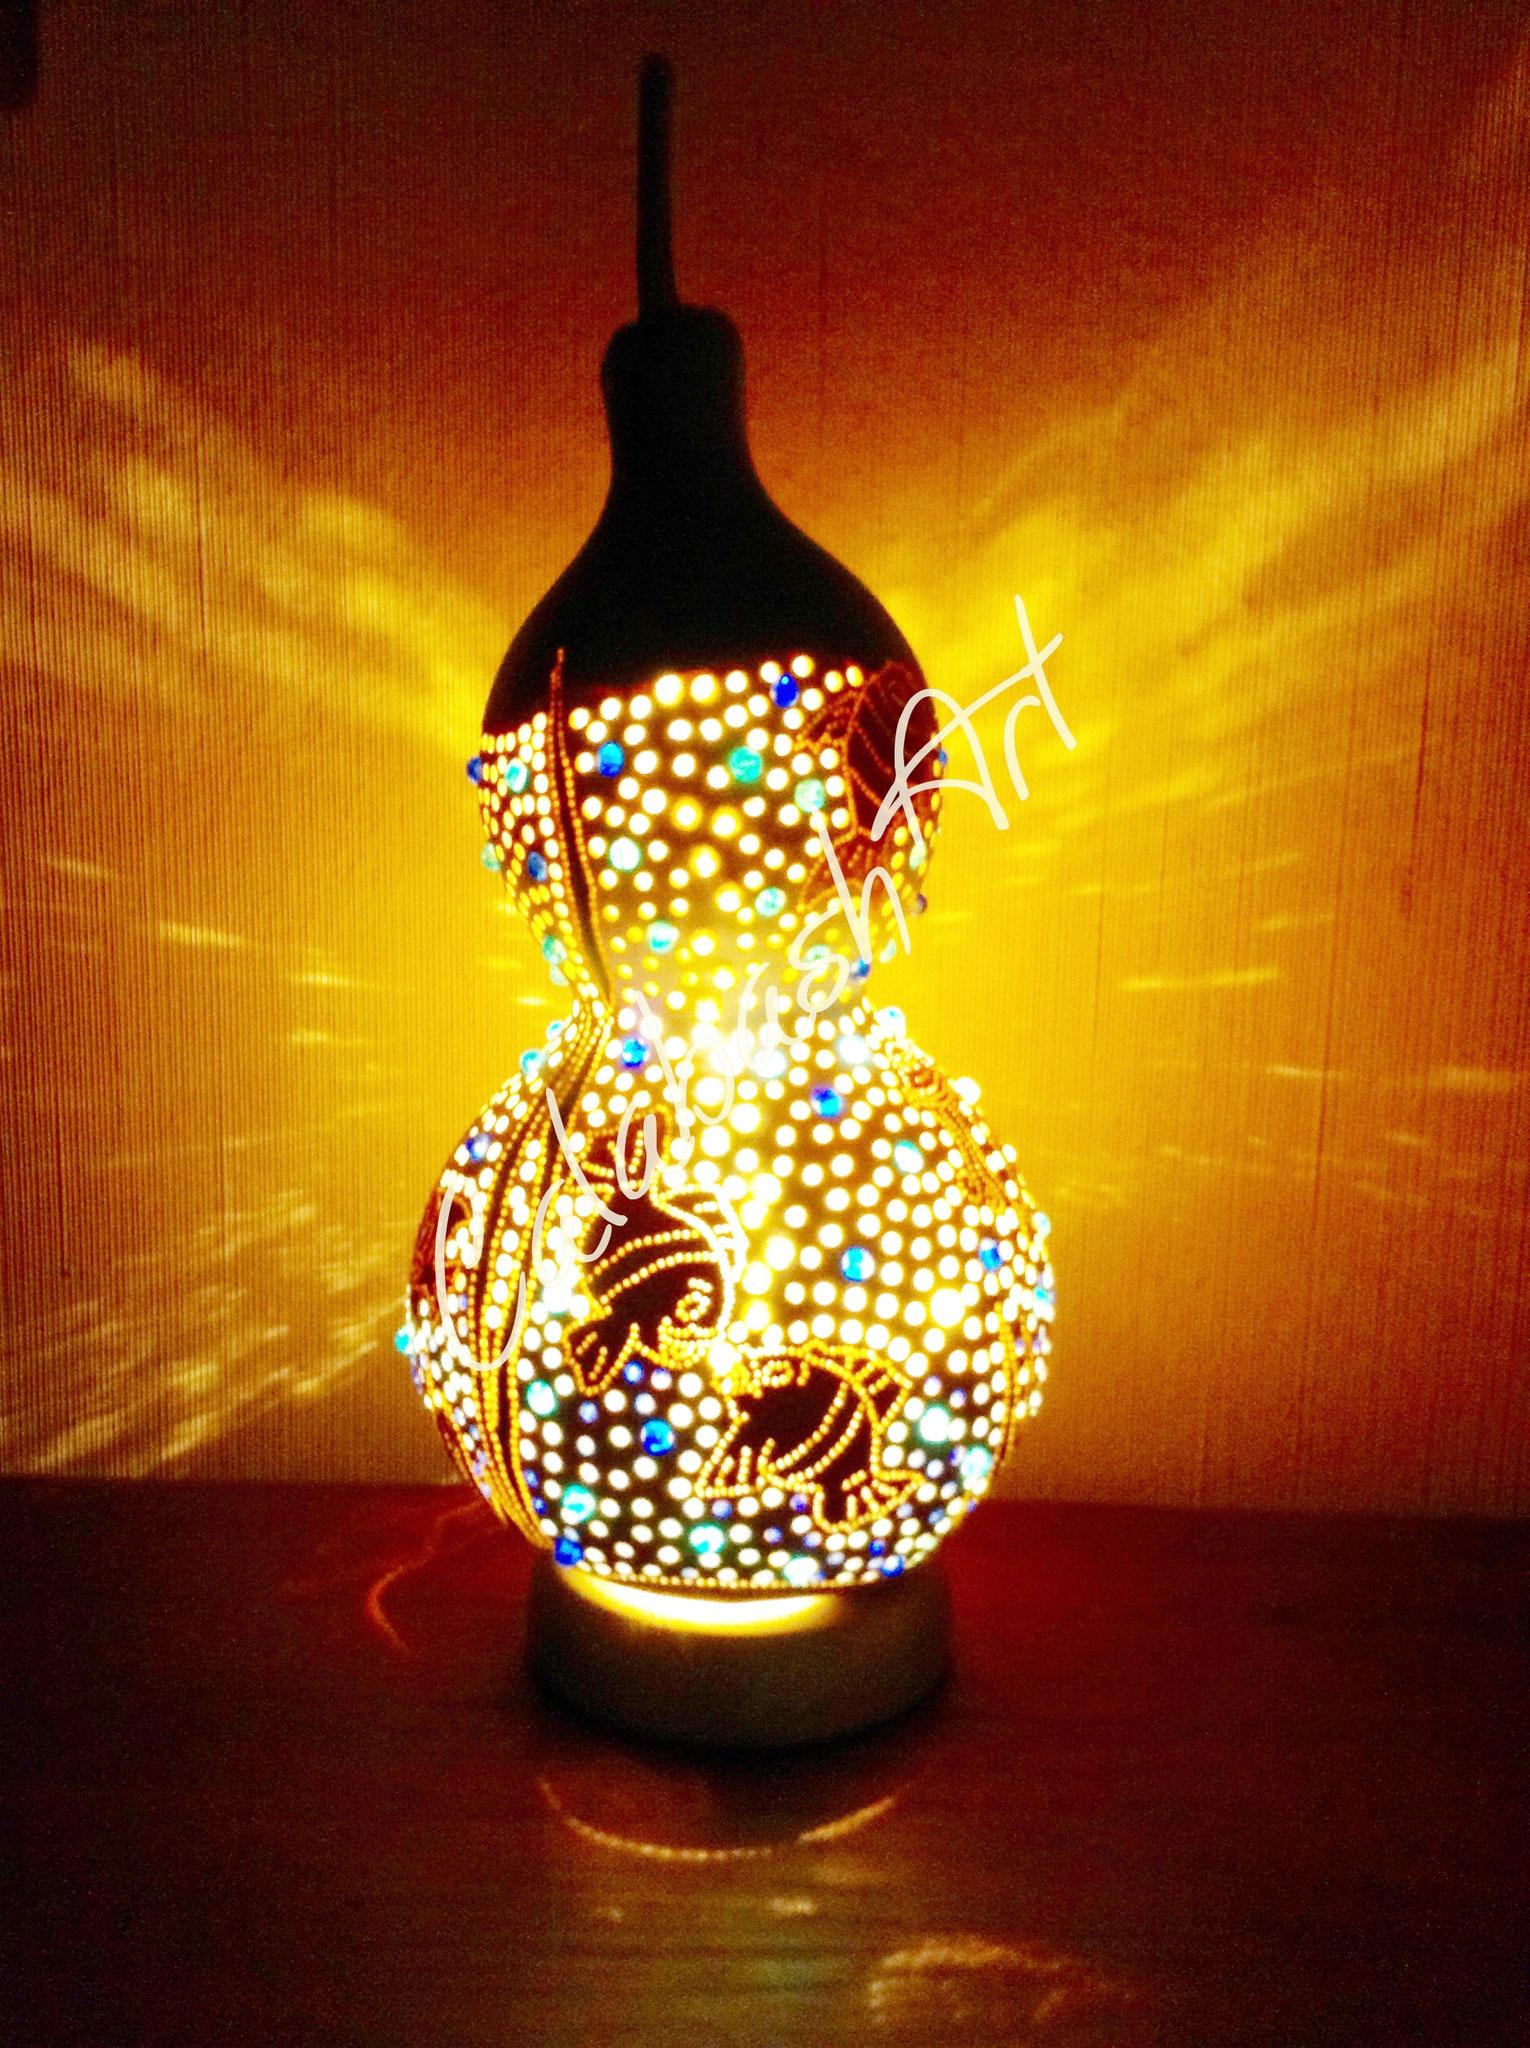 "Tischlampe, Kalebasse ""Unter dem Meer"" beleuchtet, CalabashArt"